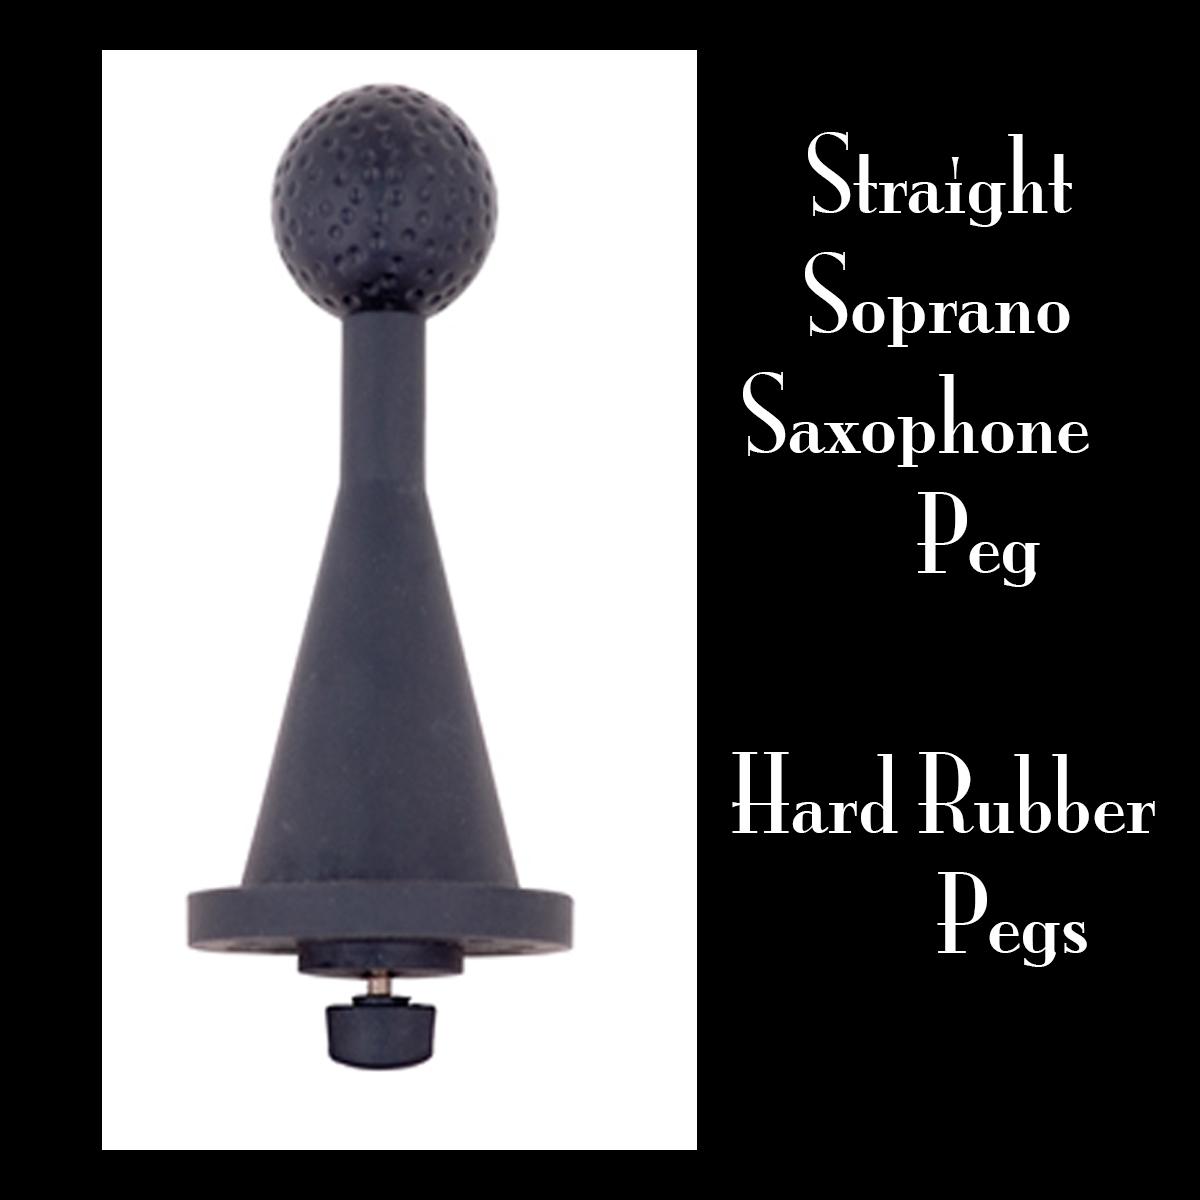 Straight Soprano Saxophone Peg